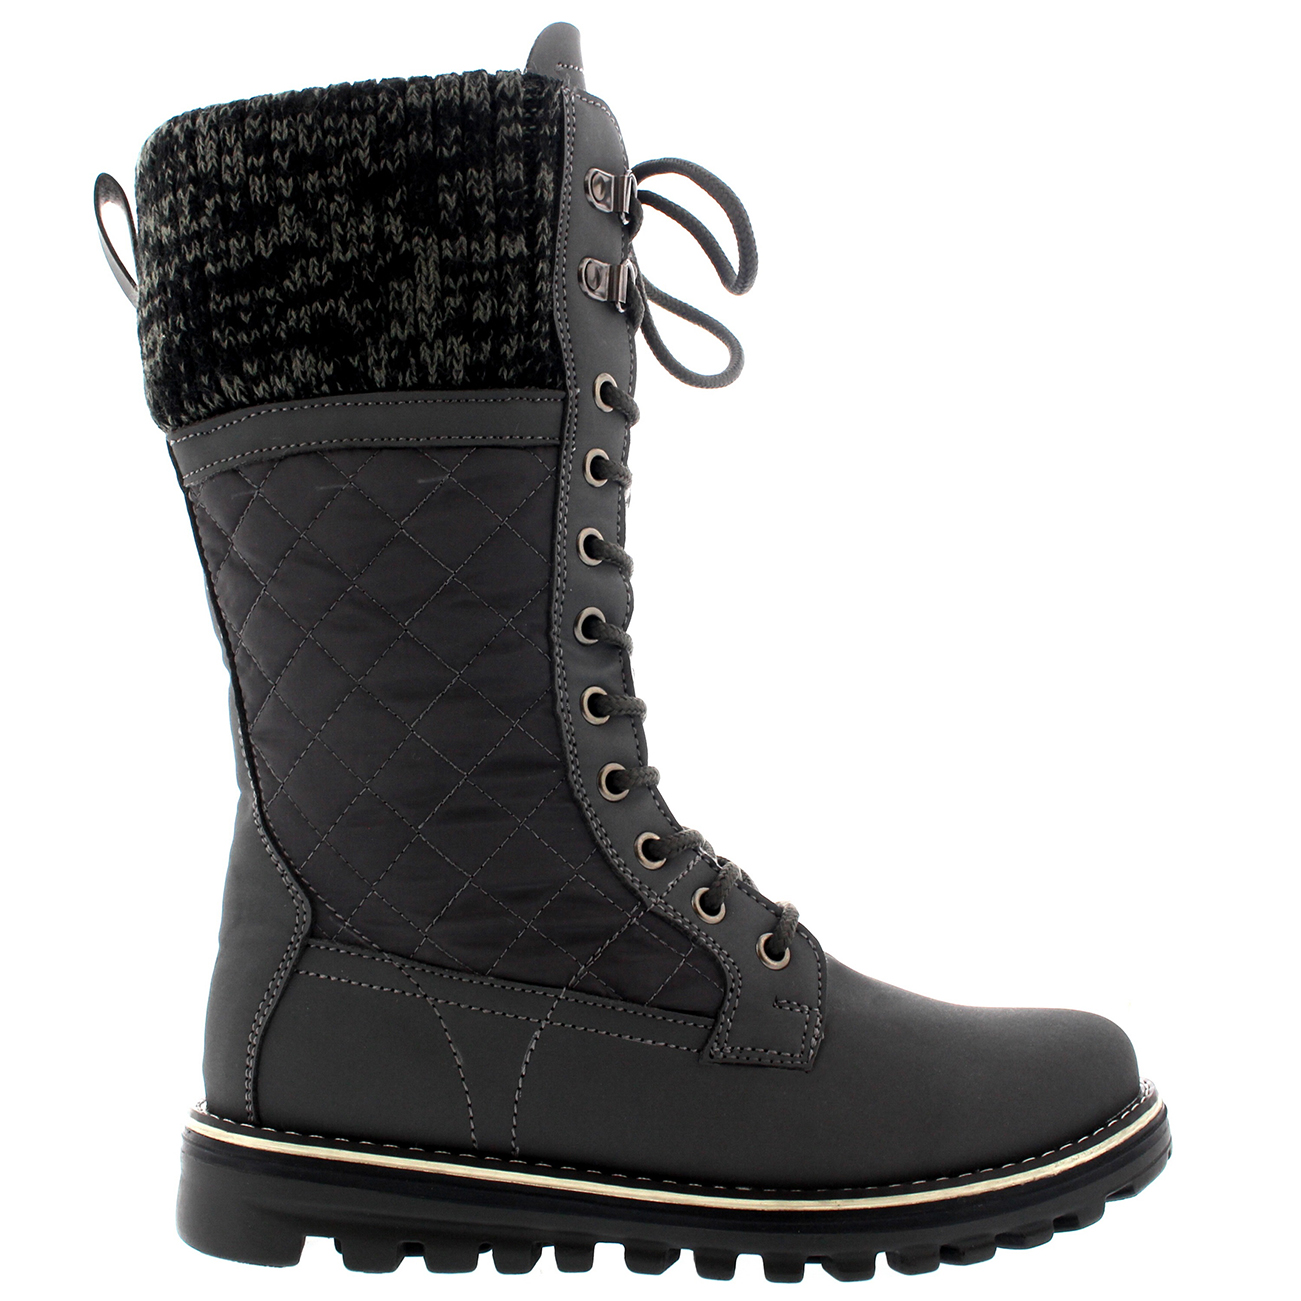 Womens Snow Durable Outdoor Thermal Winter Warm Waterproof ...